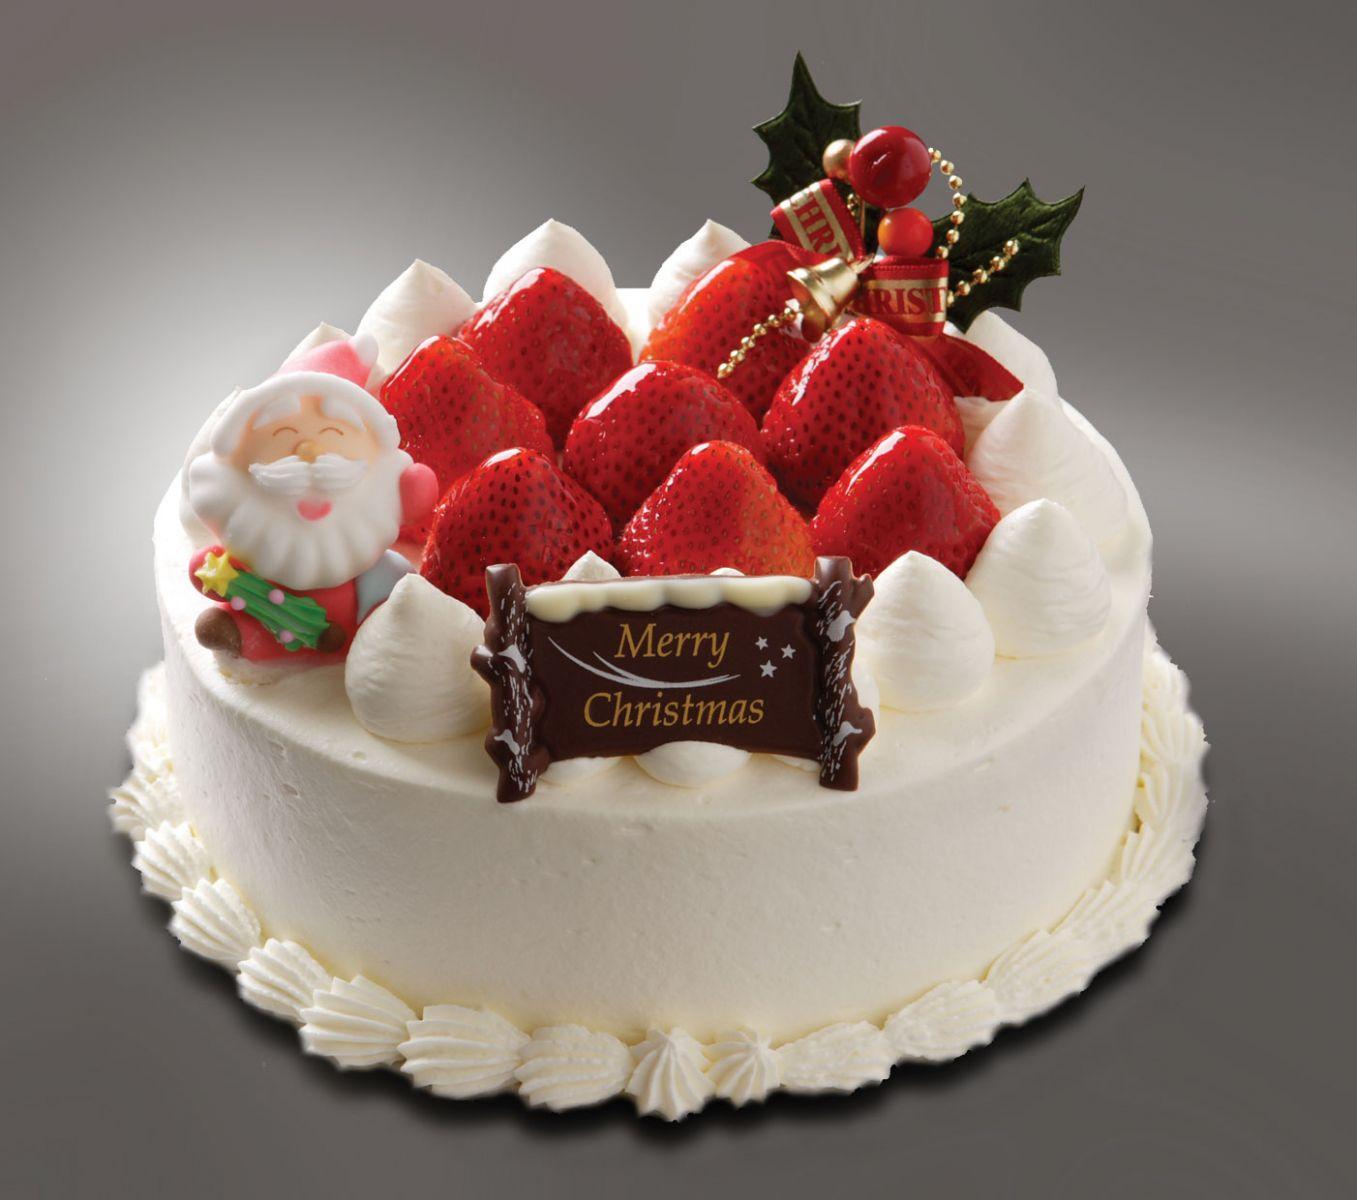 dolci di Natale calorici torta con panna